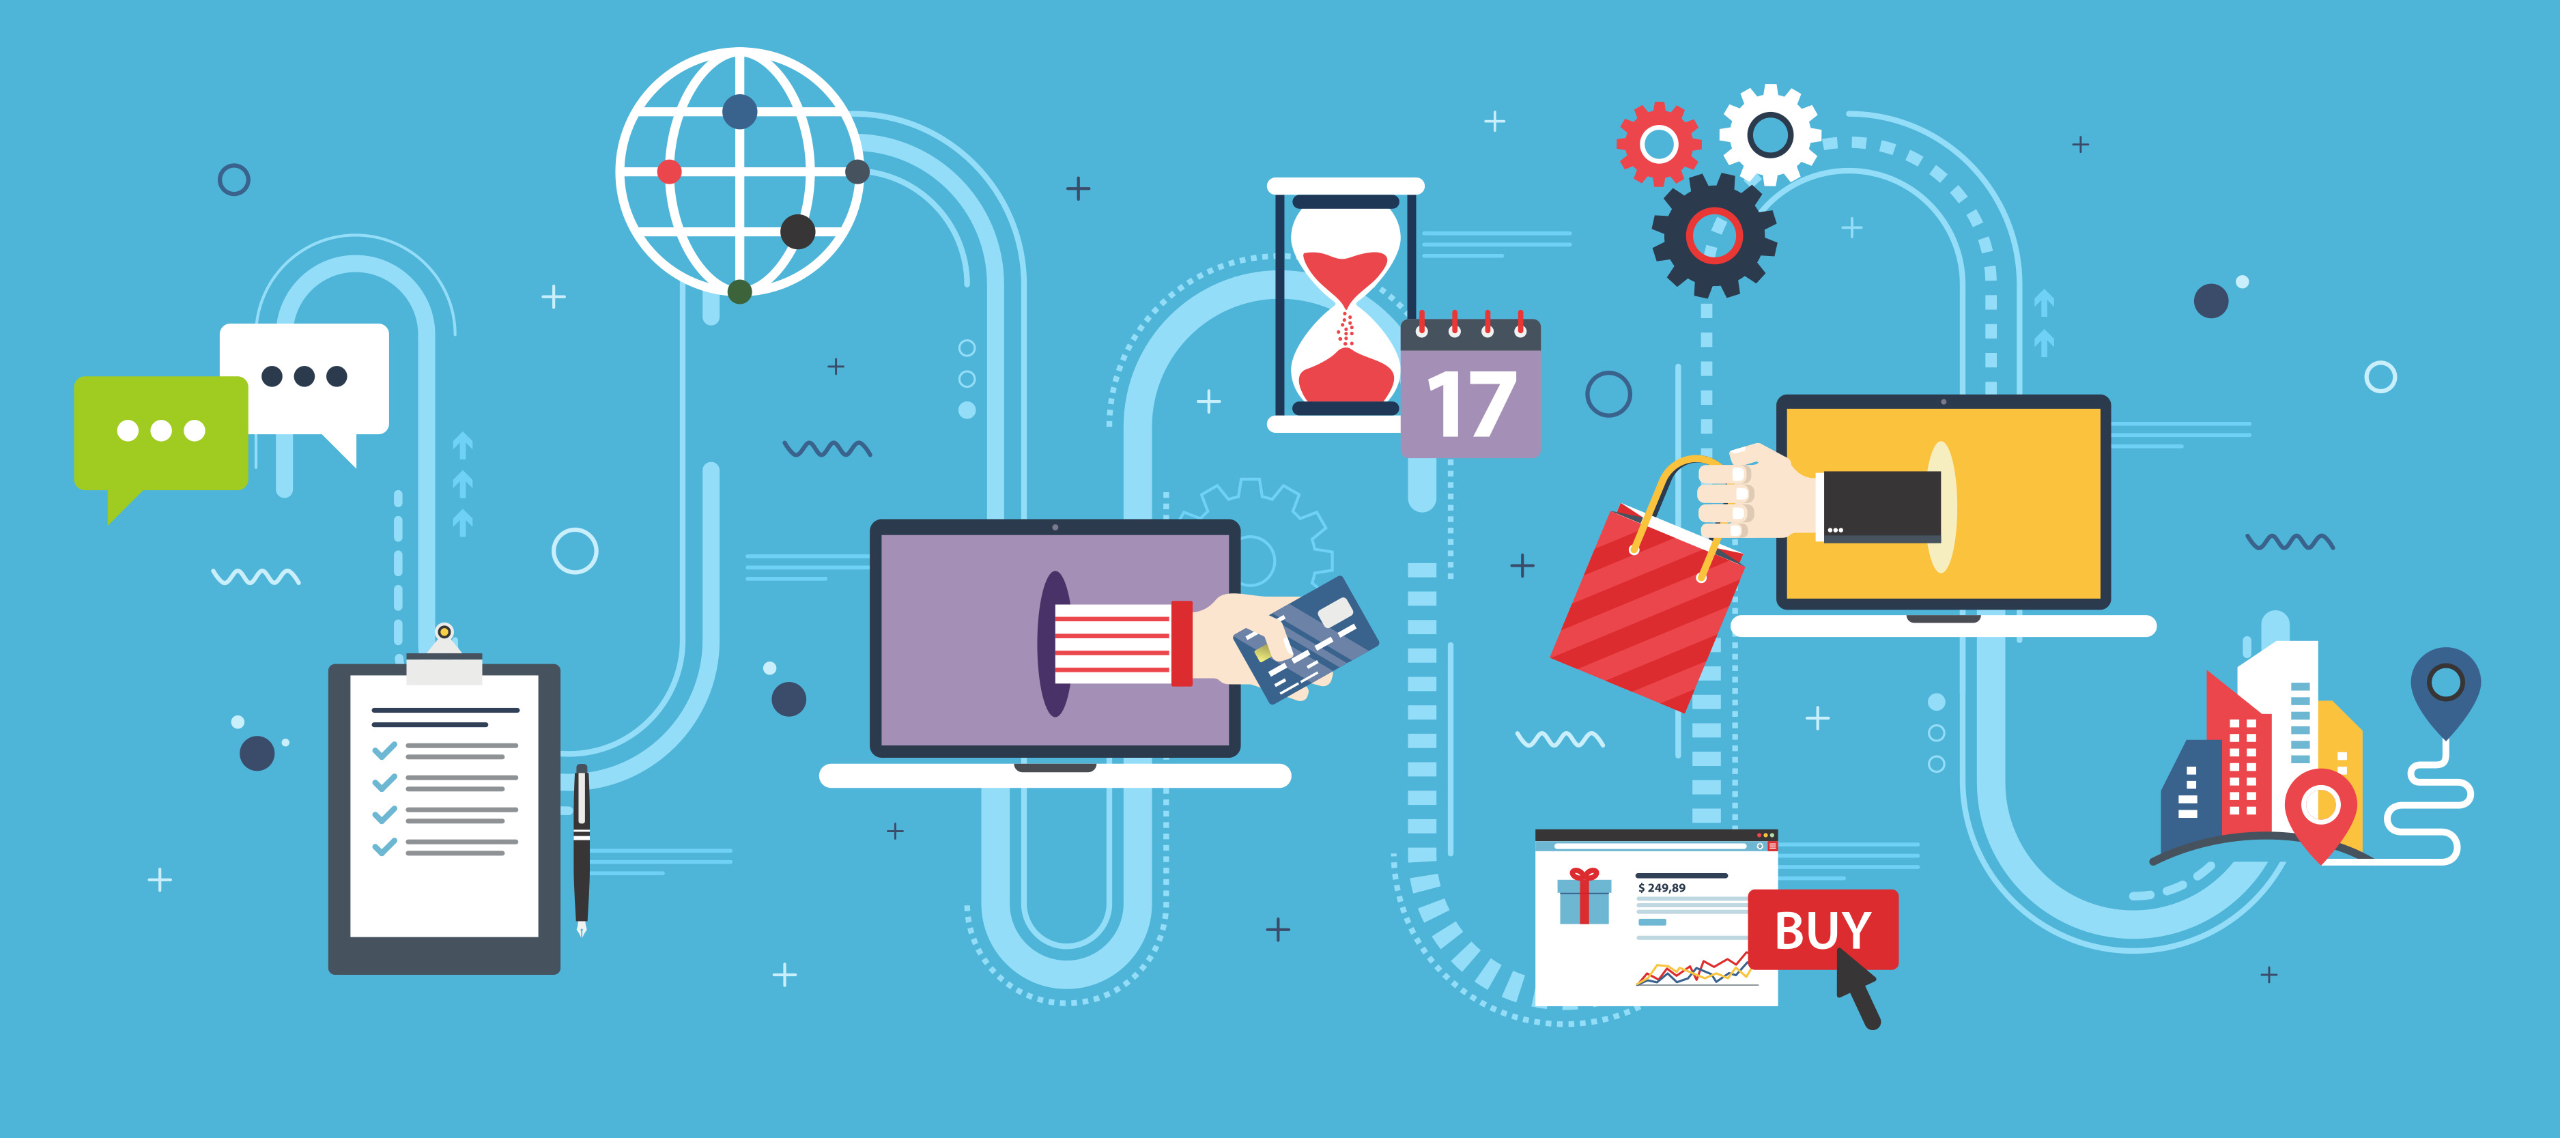 2019-2022 datos sobre comercio electrónico en Latinoamérica   Americas  Market Intelligence